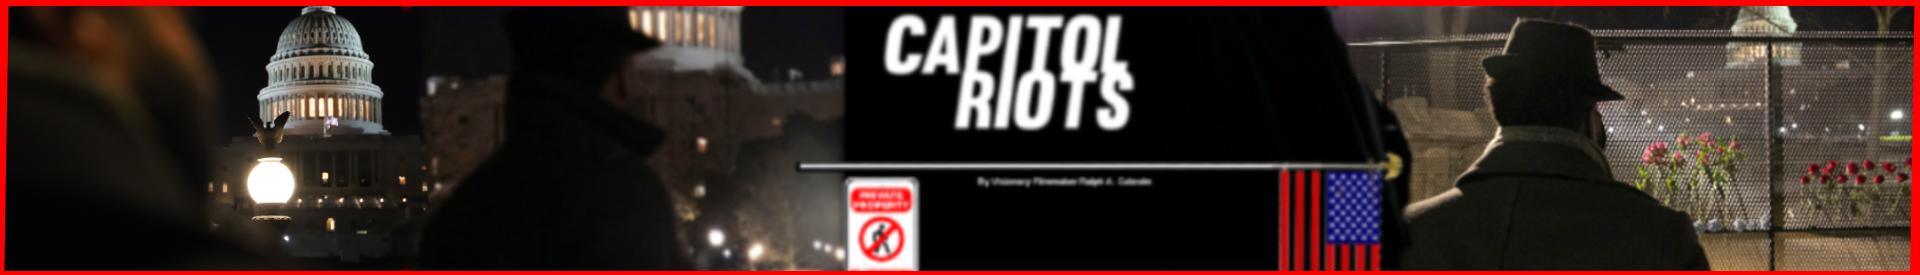 CAPITOL RIOTS MOVIE   WORLD PREMIERE